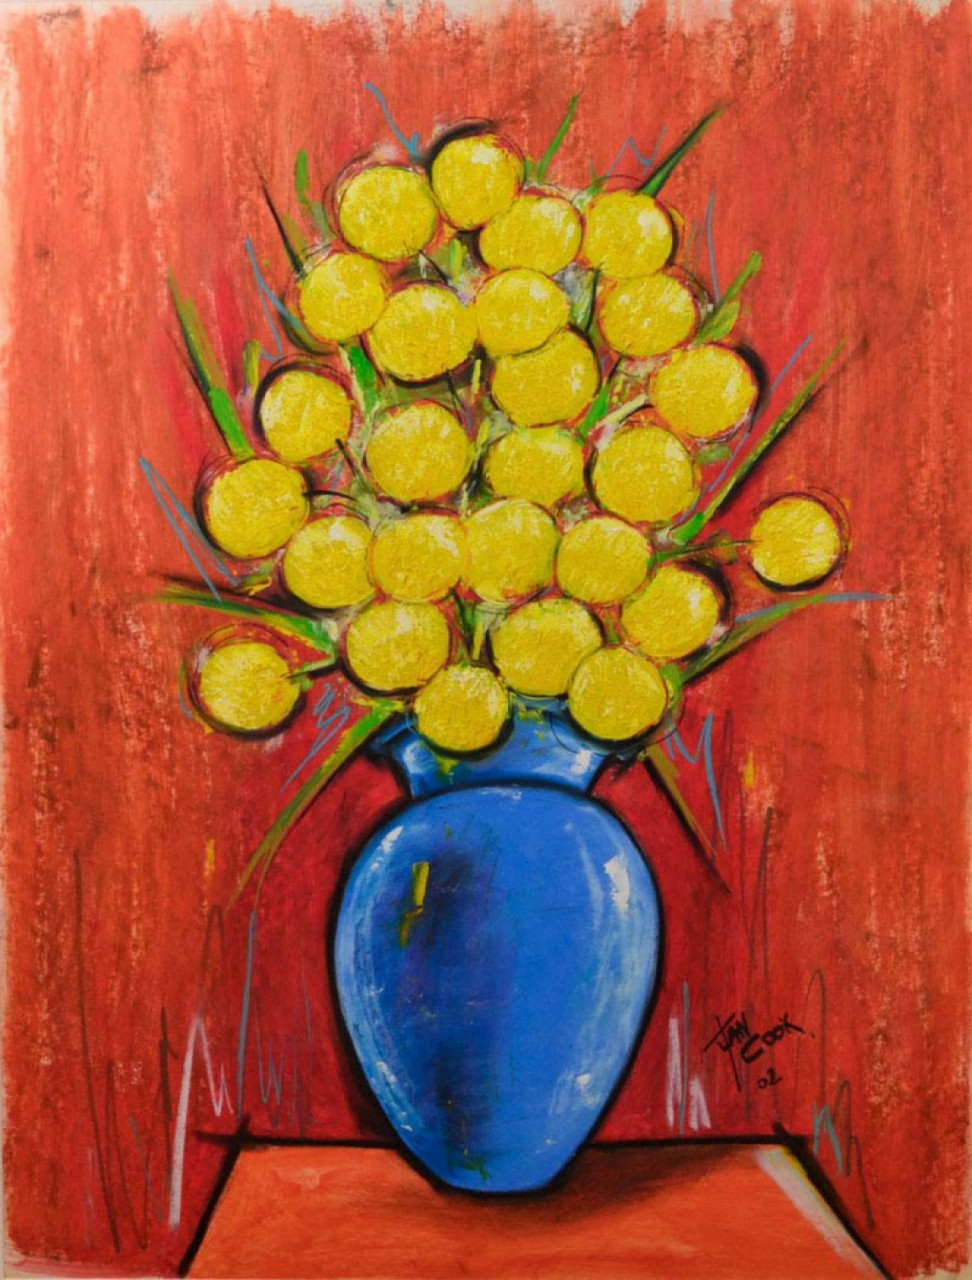 COOK Juan fleurs jaunes vase bleu